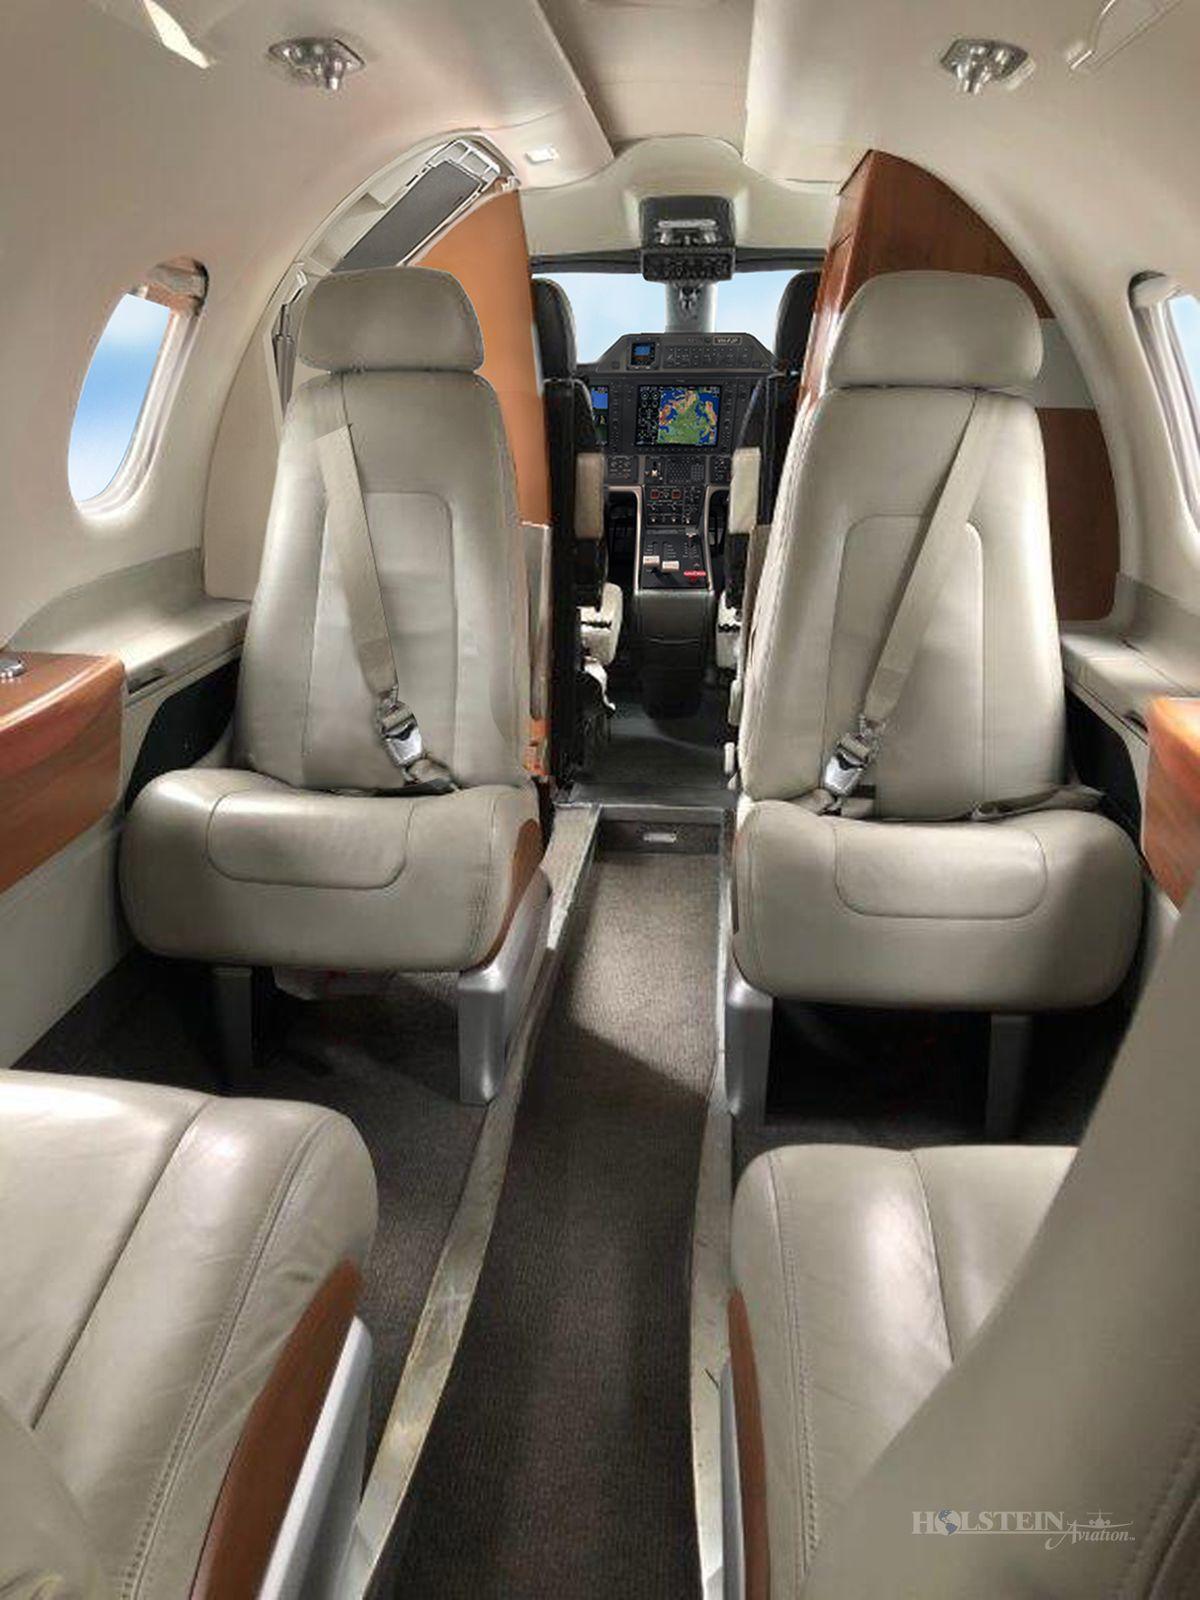 2011 Embraer Phenom 100 - SN 50000237 - VH-FJP - Int - Aft Fac Fwd RGB.jpg